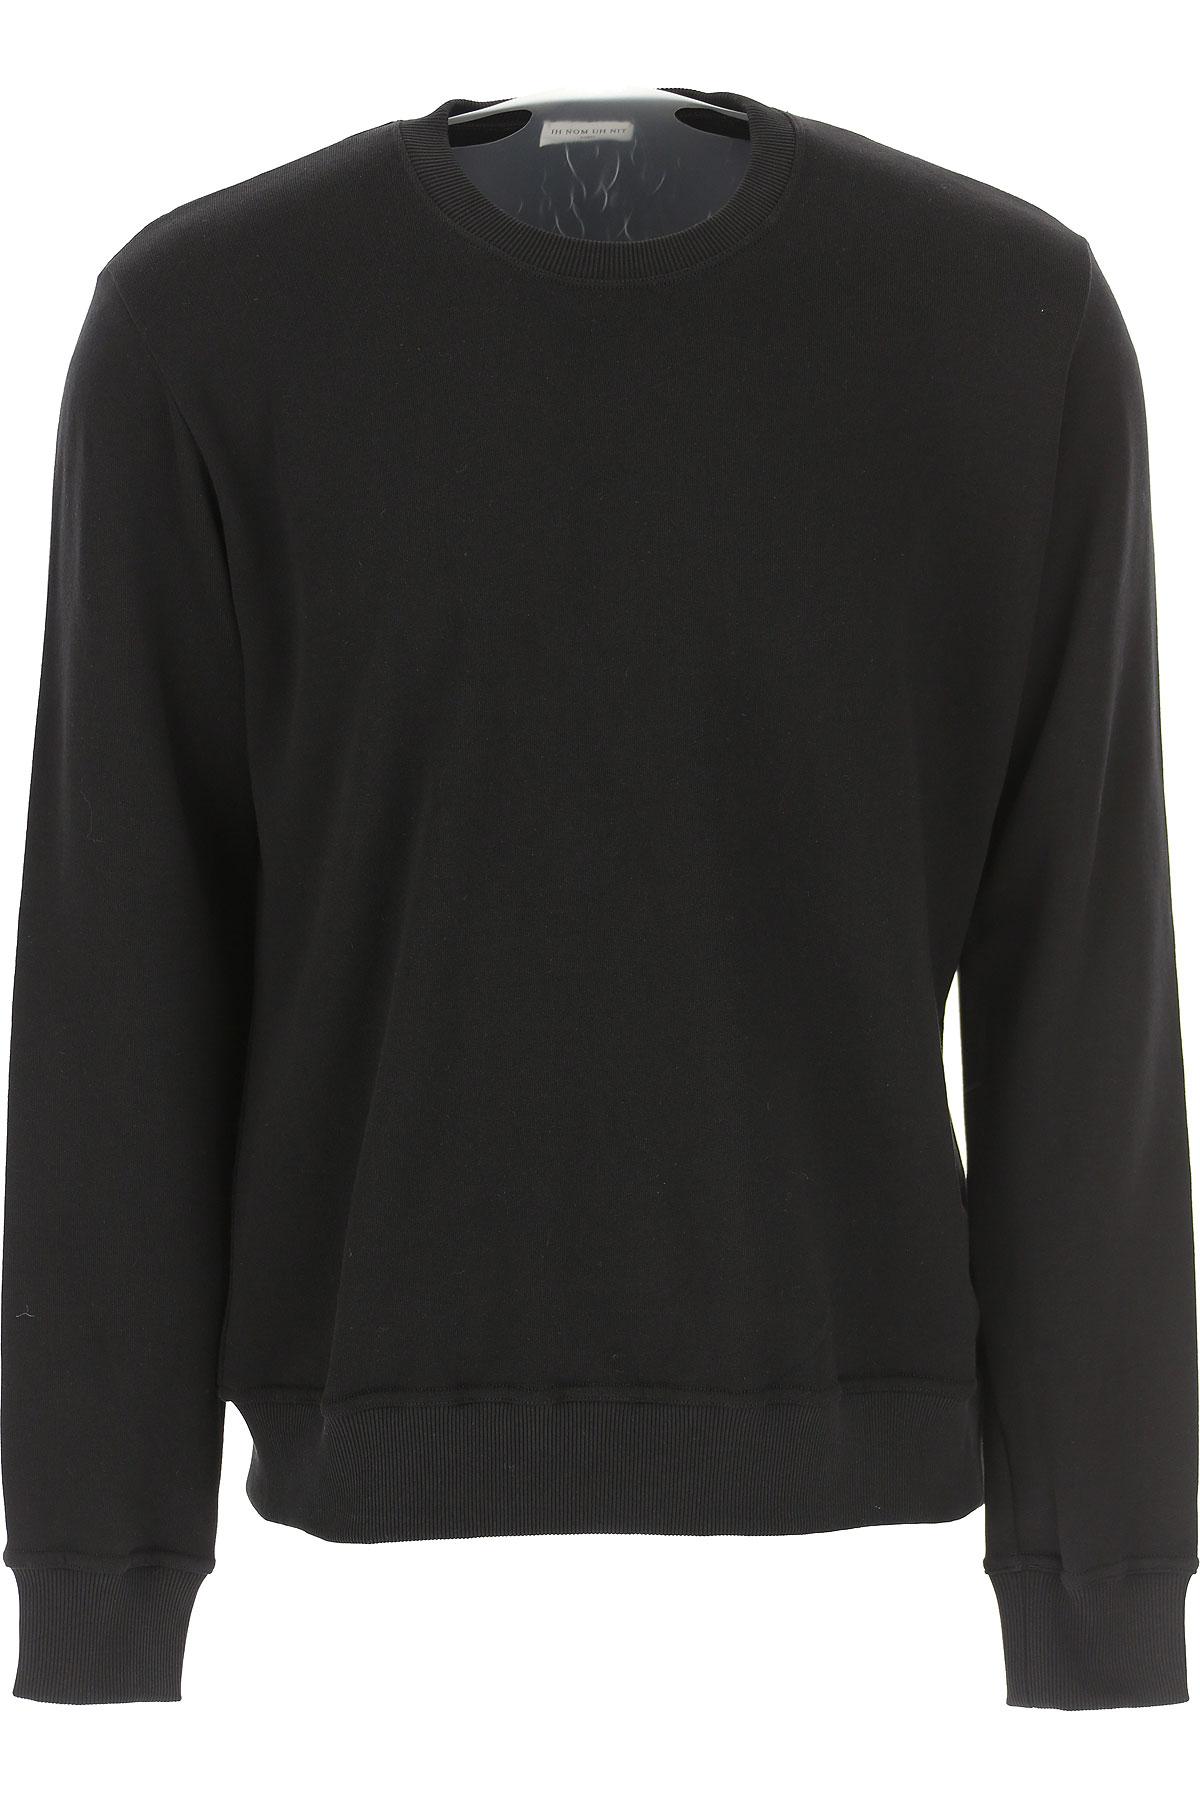 Ih Nom Uh Nit Sweatshirt for Men On Sale, Black, Cotton, 2019, L S XL